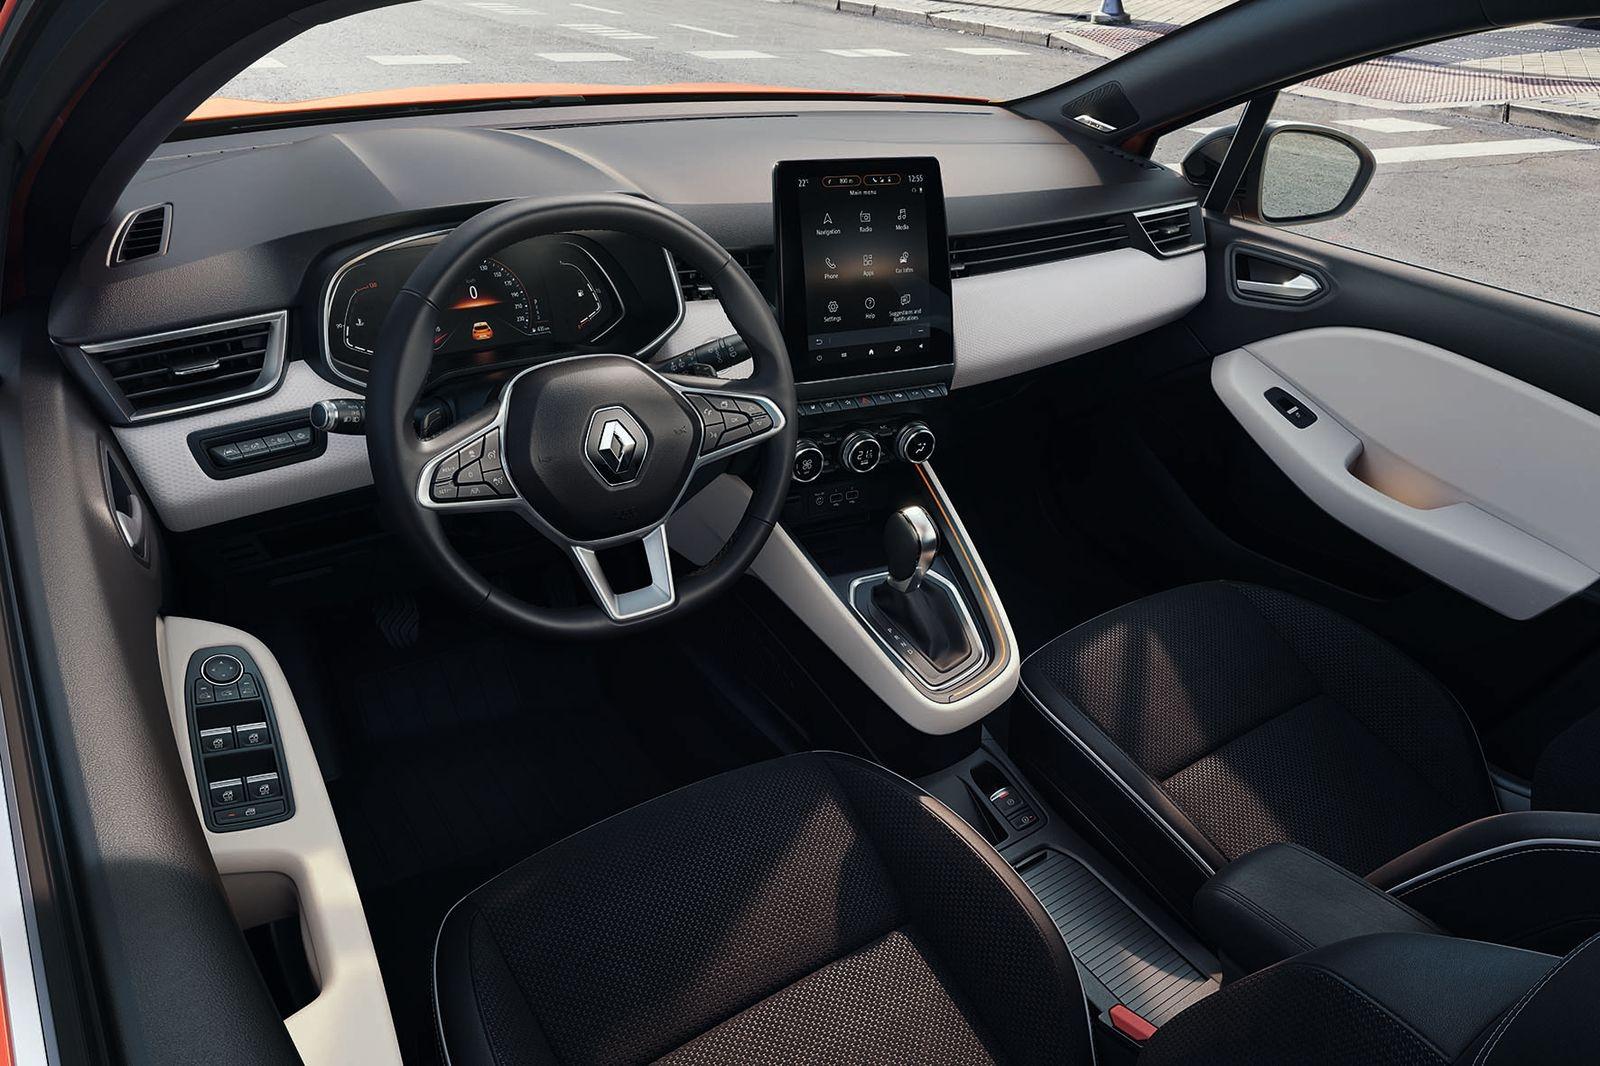 Renault_Clio_2019_AutoRok_06